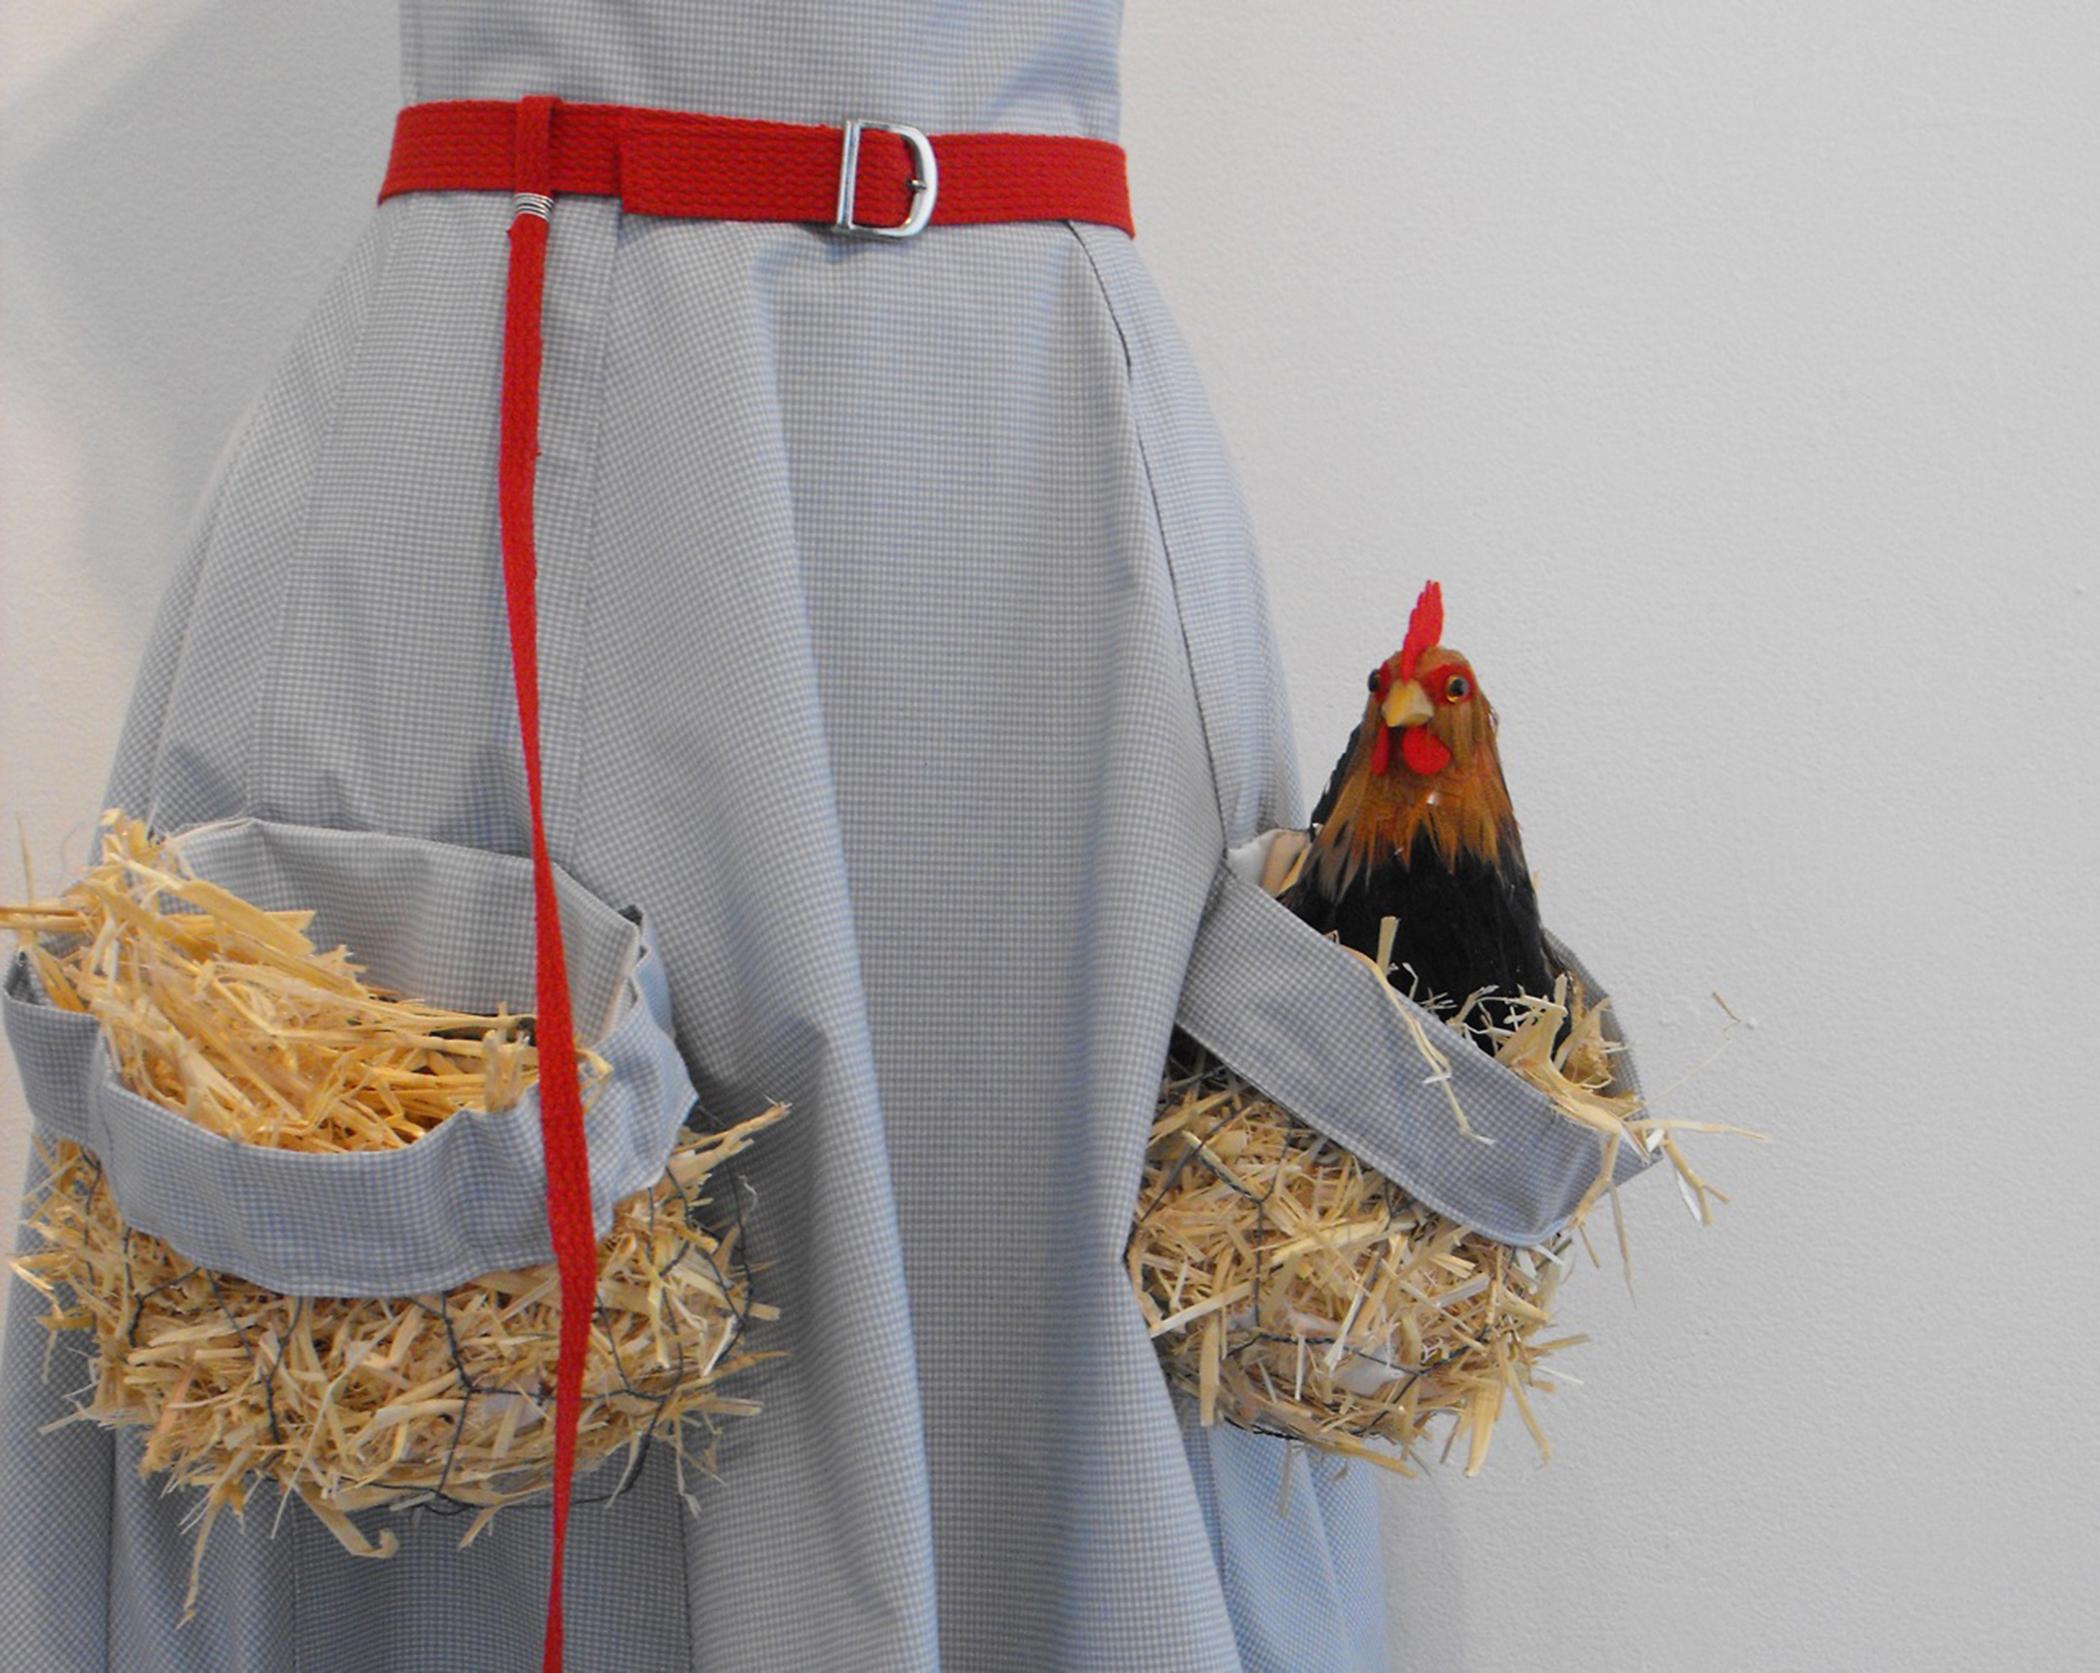 Two Chicken Dress, detail